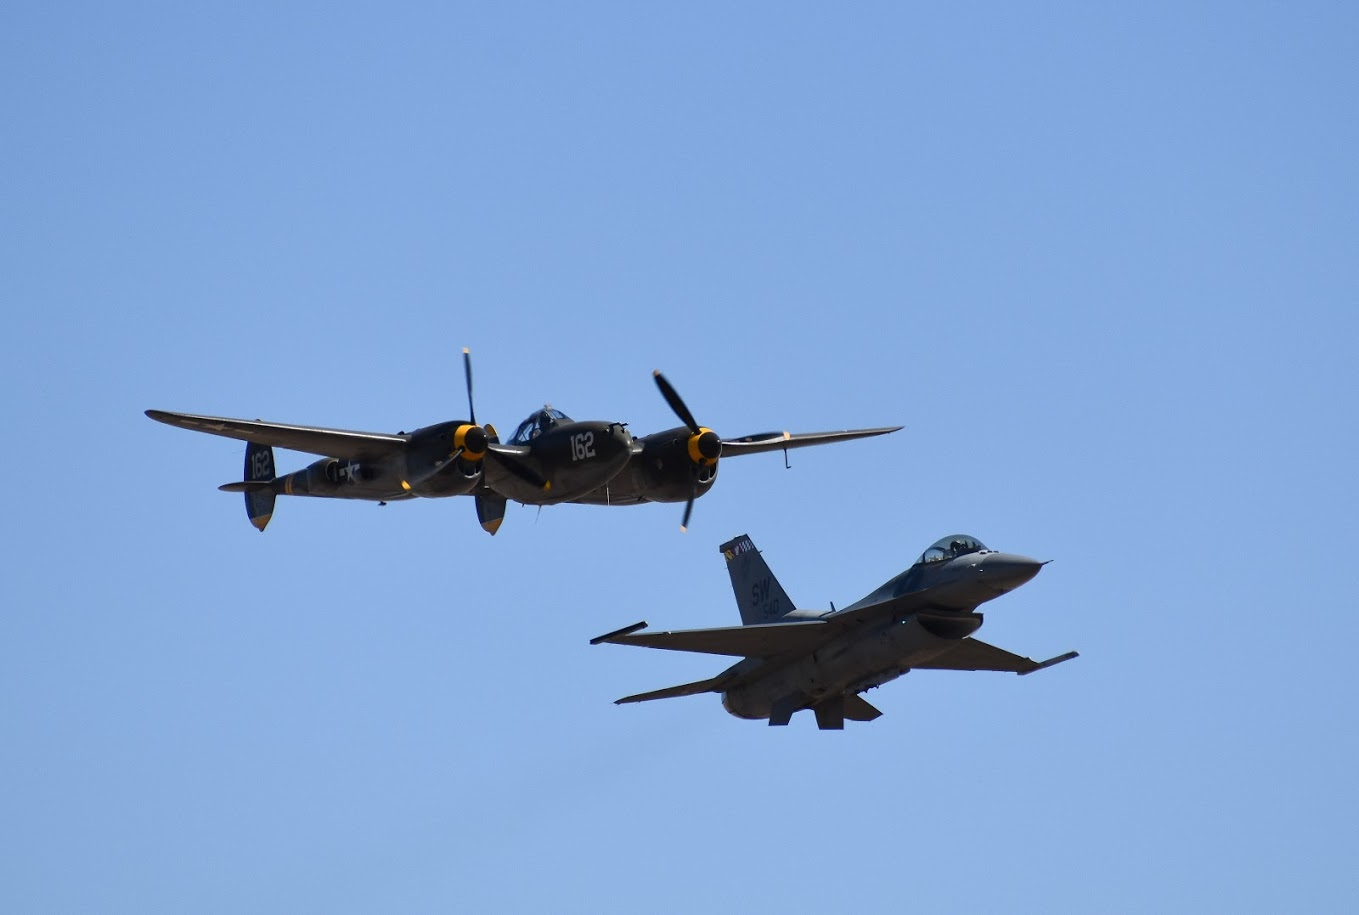 P38 Lightning and F15